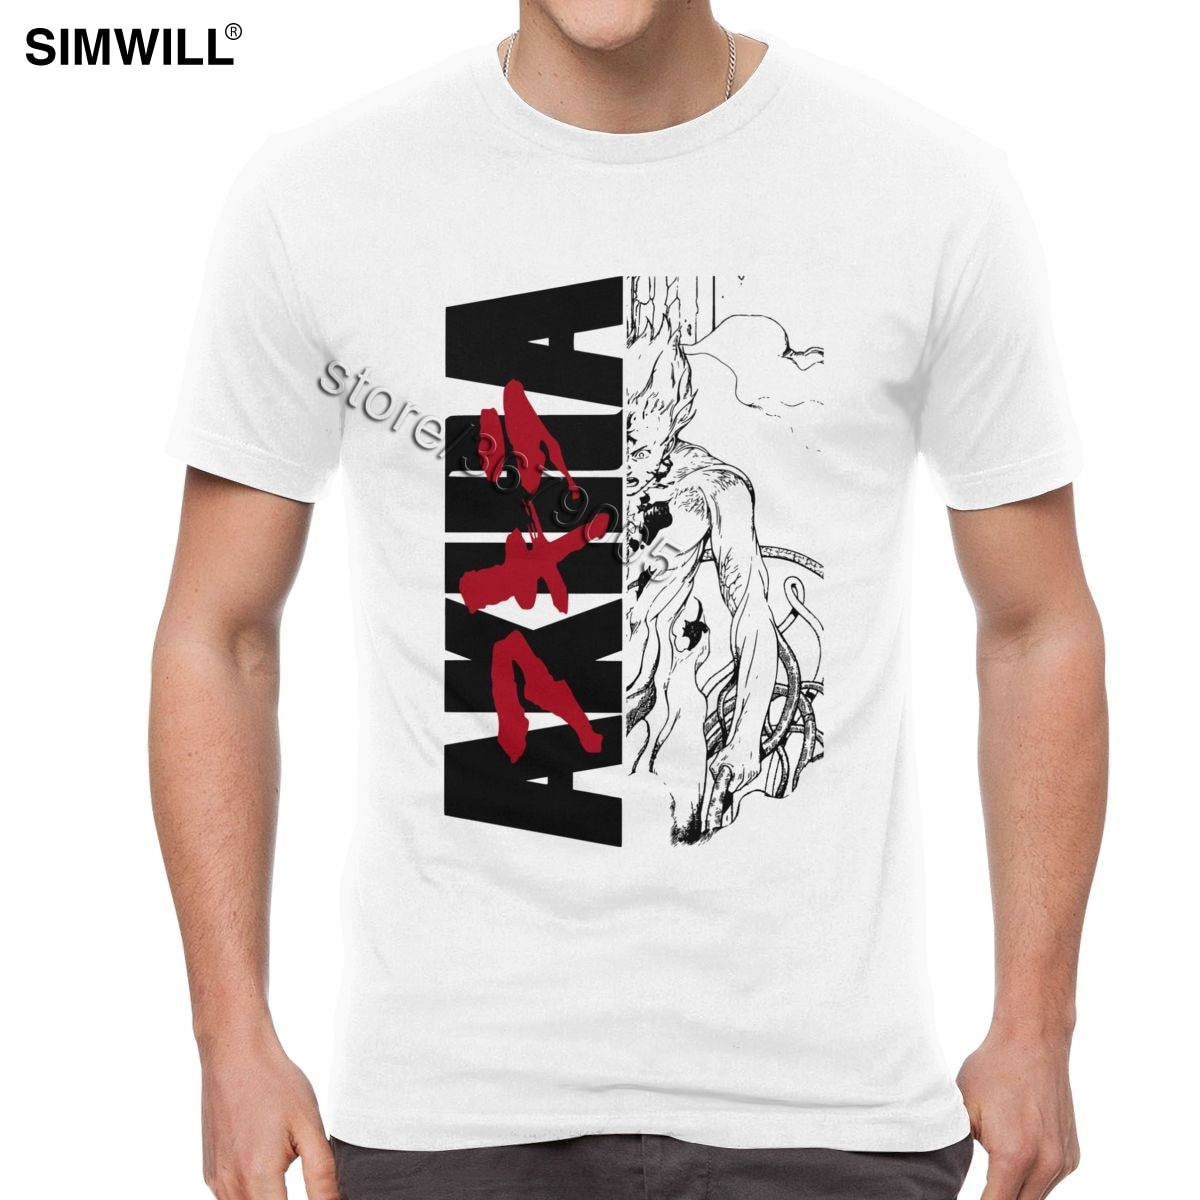 Los hombres Akira T camisa Shotaro Kaneda camisetas Streetwear Neo camiseta con...